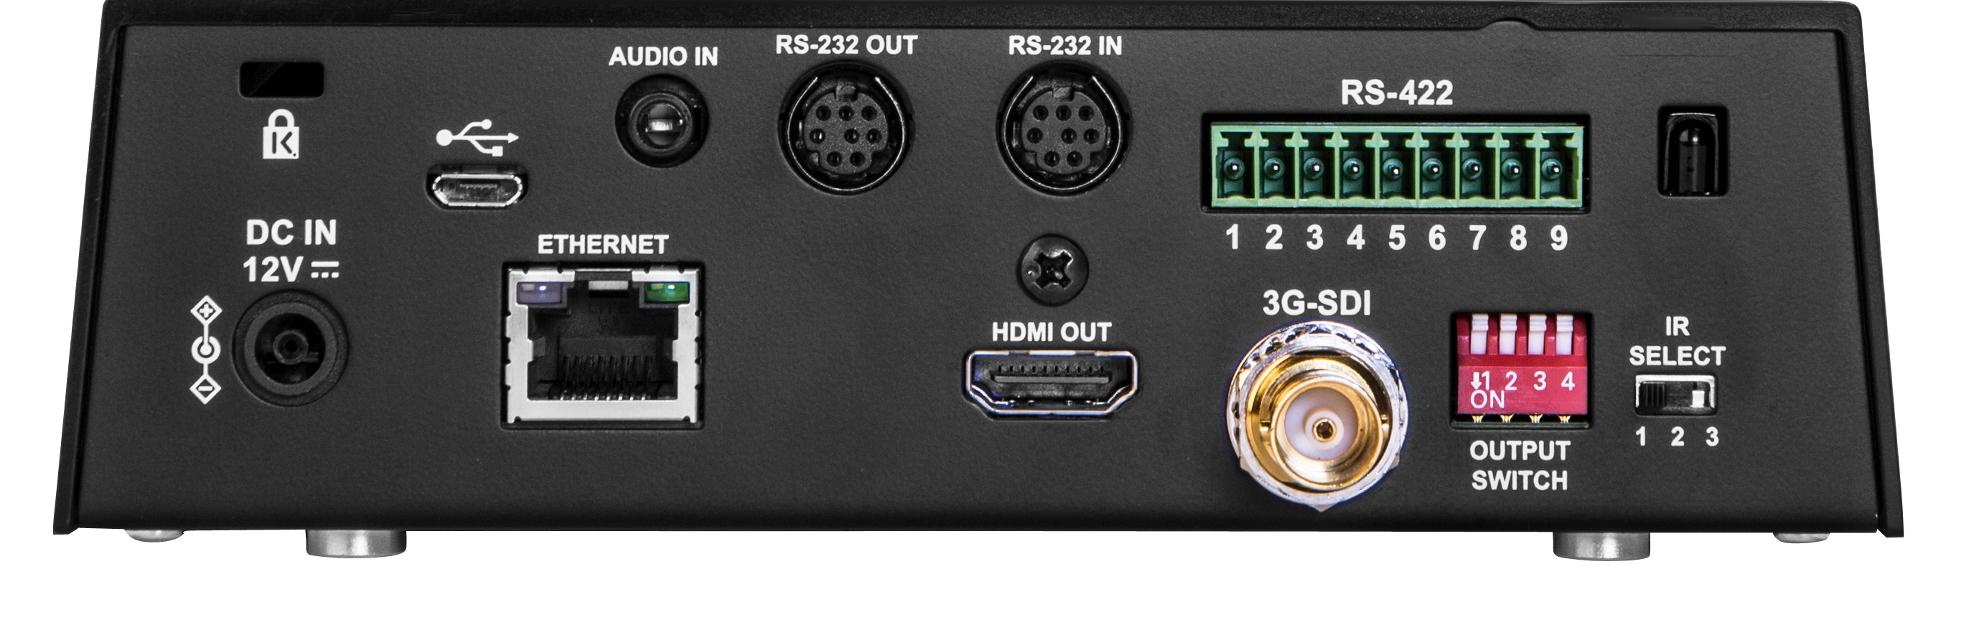 f8f01de522c Marshall Electronics CV620-IP 2MP HD PTZ Camera